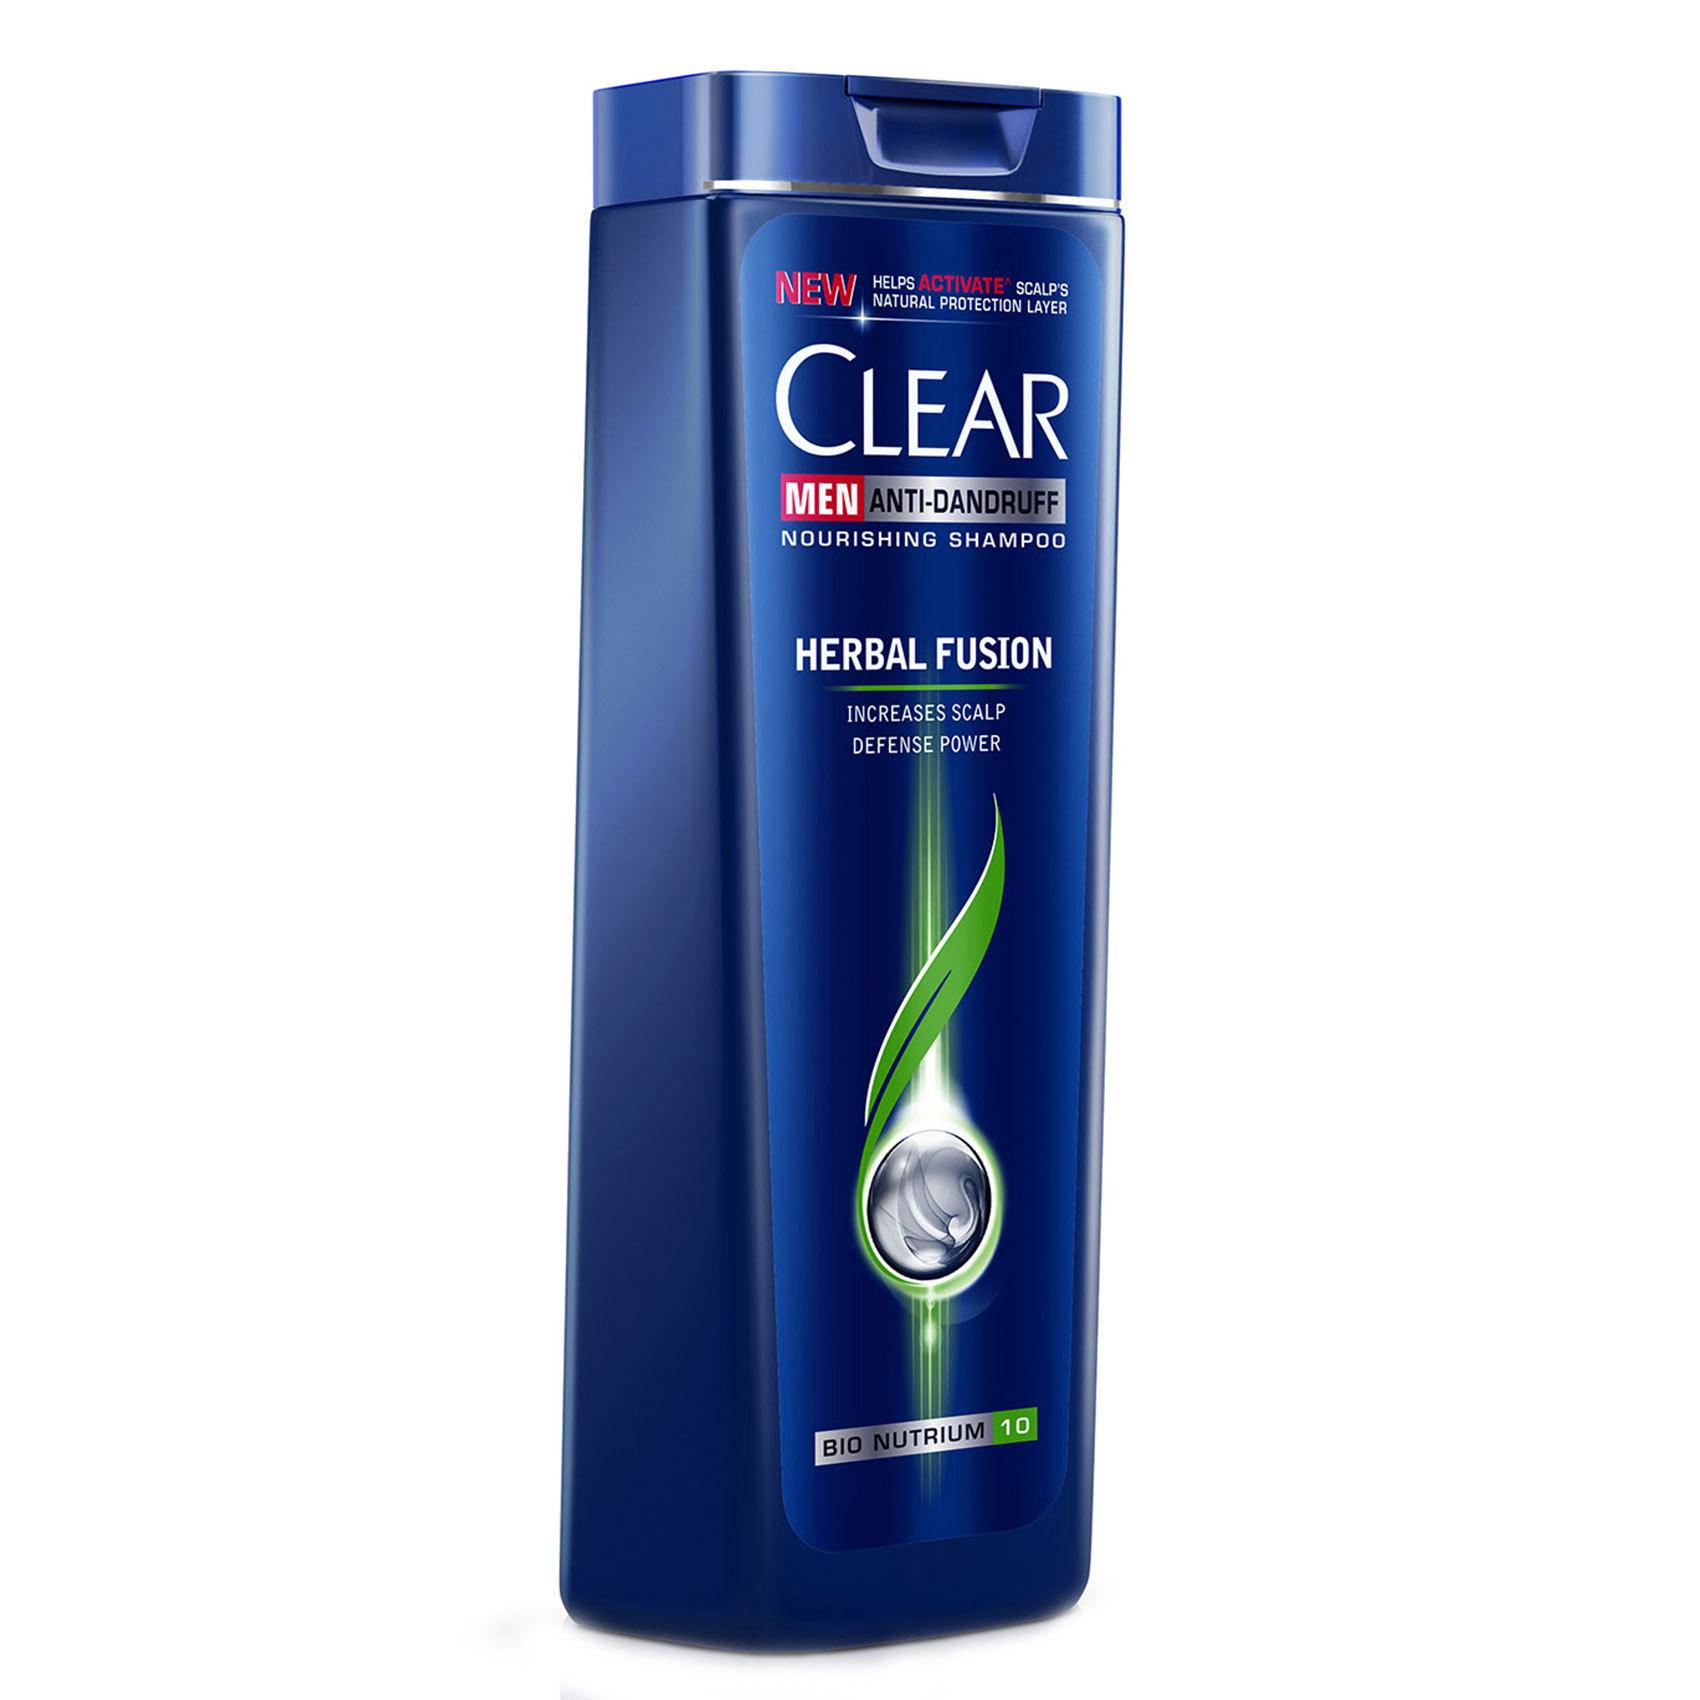 CLEAR SHAMP HERB FUS MEN 400ML